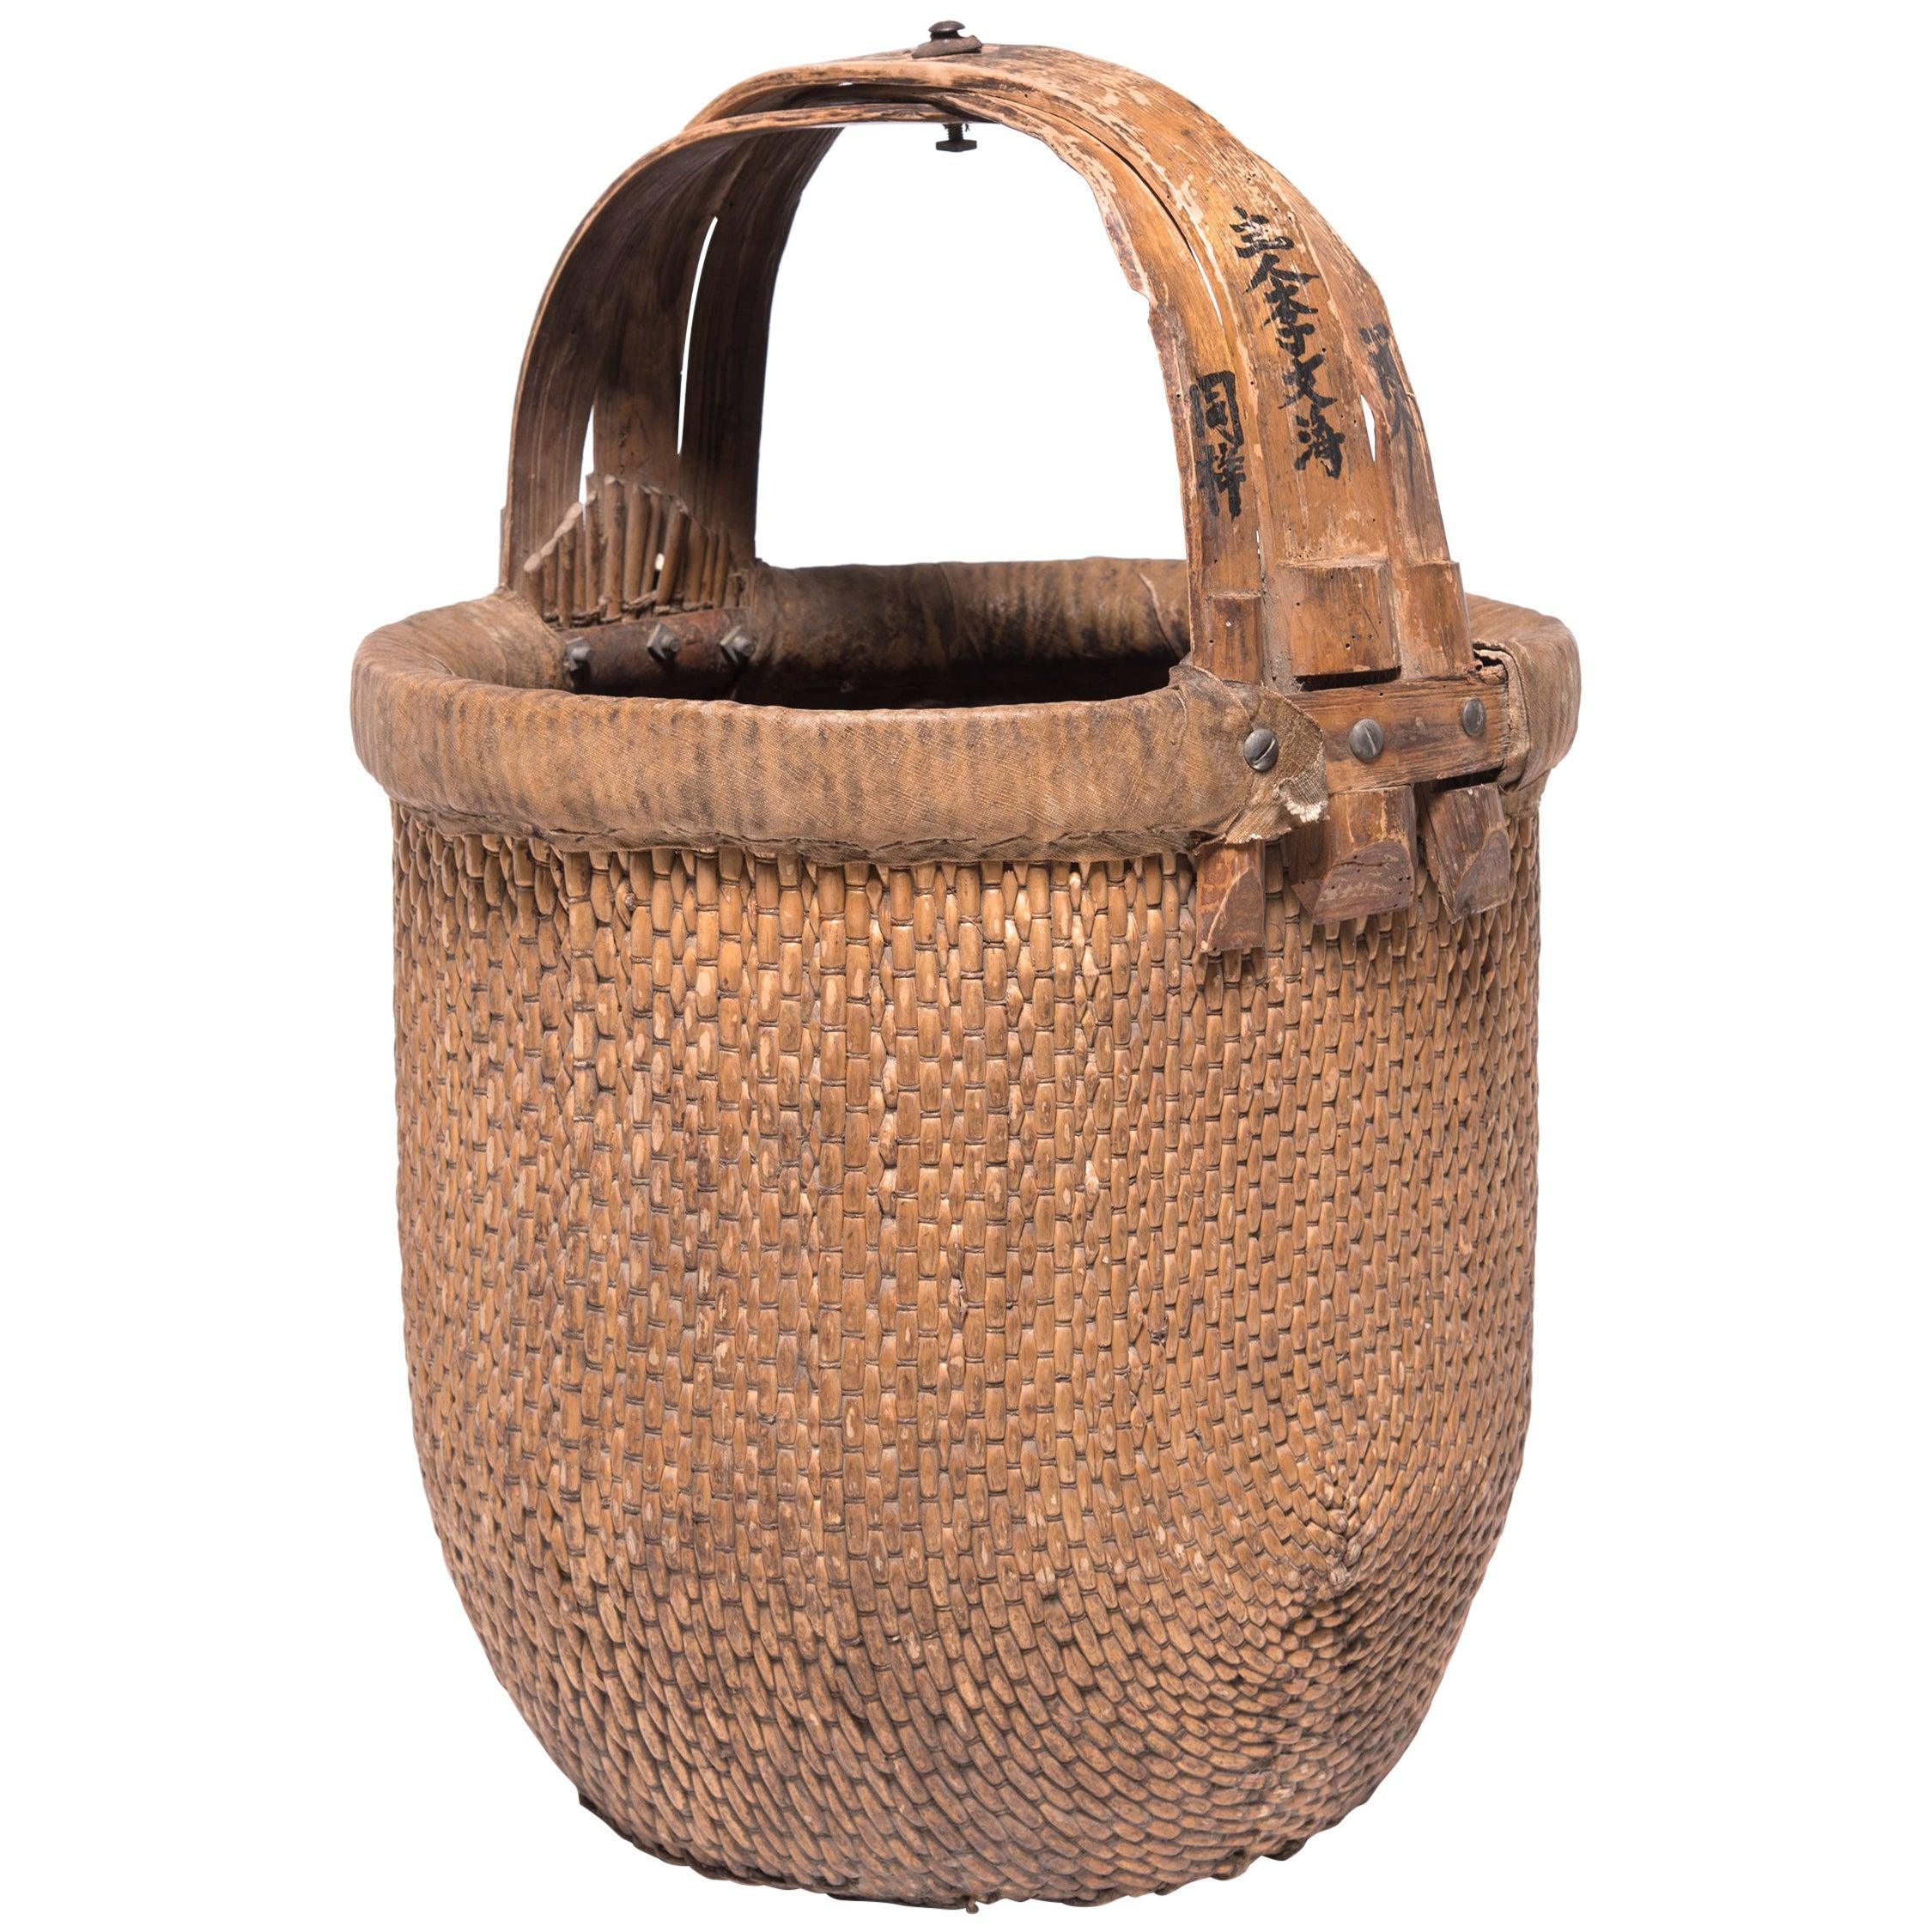 Chinese Bent Handle Basket, circa 1850